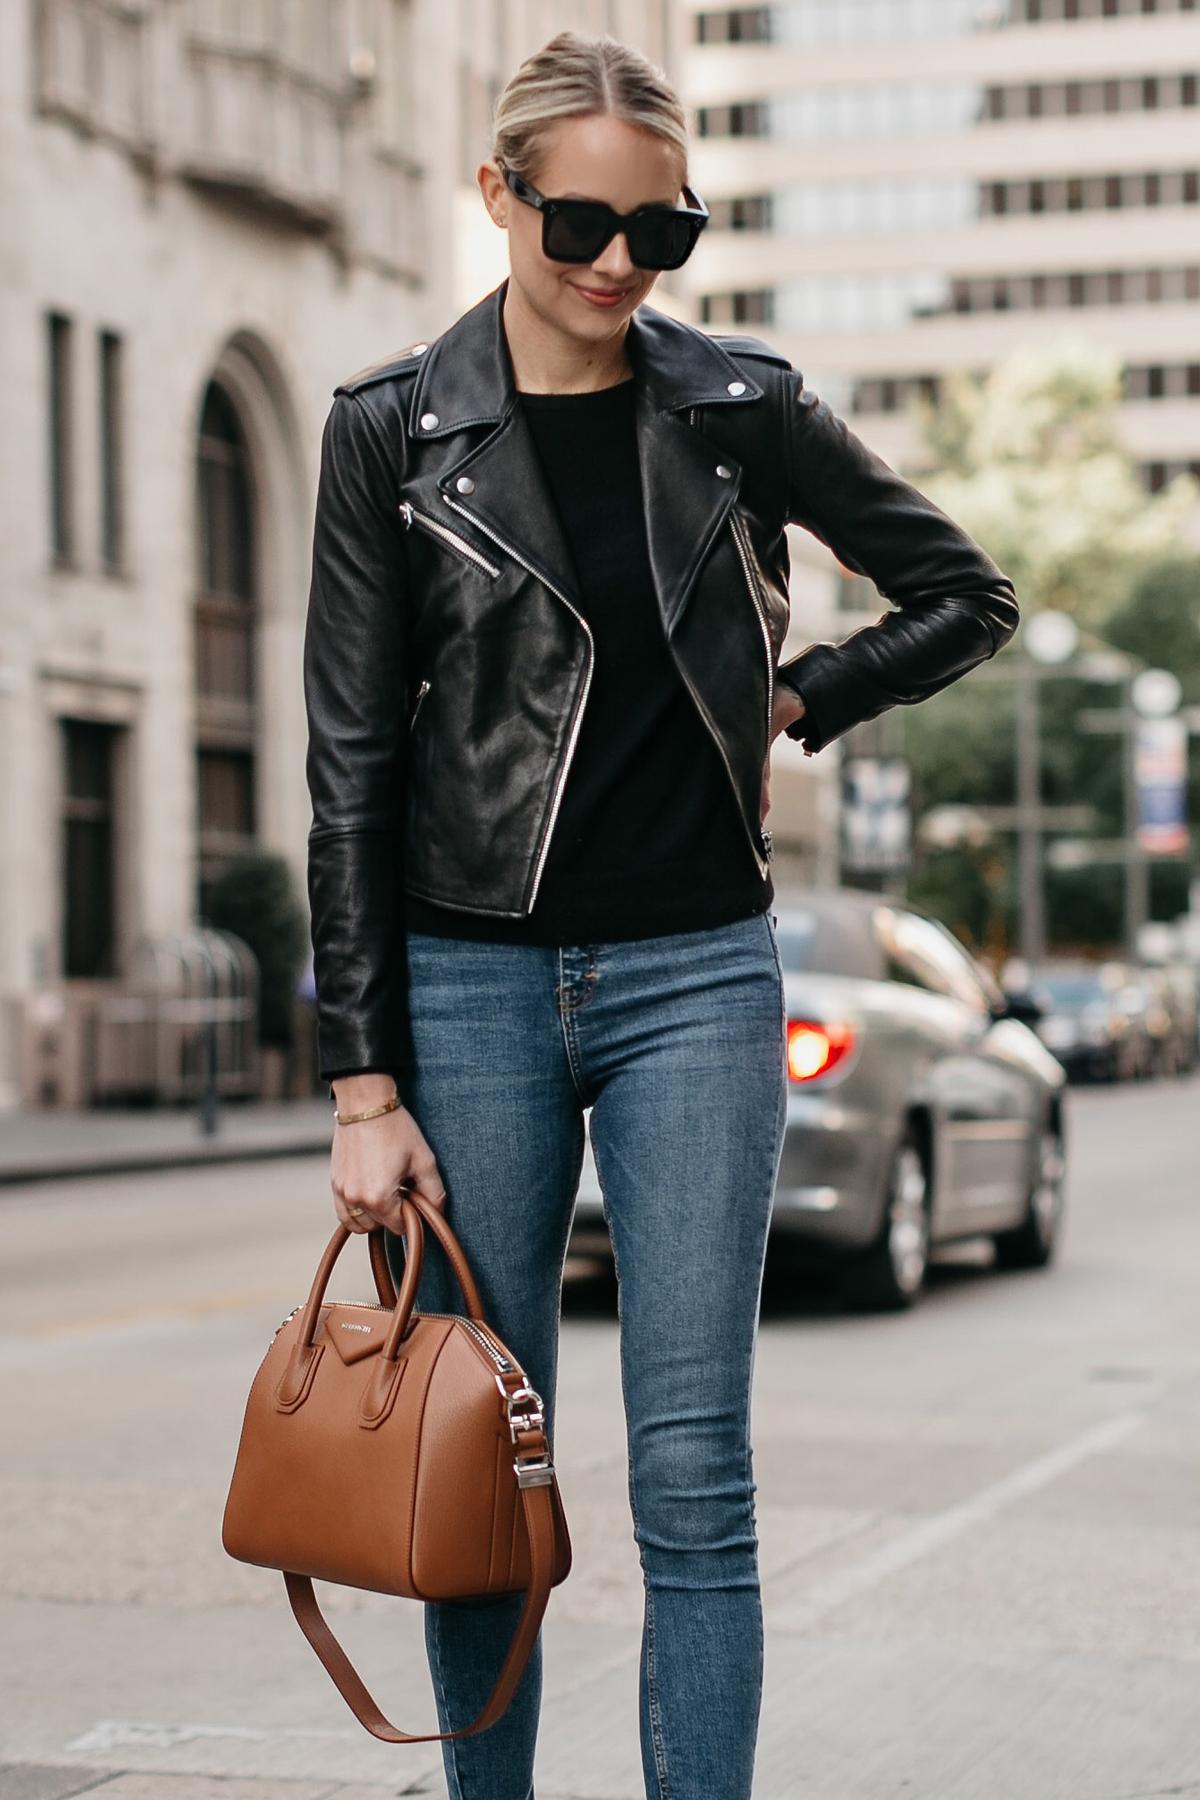 Blonde Woman Wearing Black Leather Jacket Denim Skinny Jeans Givencny Antigona Cognac Satchel Fashion Jackson Dallas Blogger Fashion Blogger Street Style